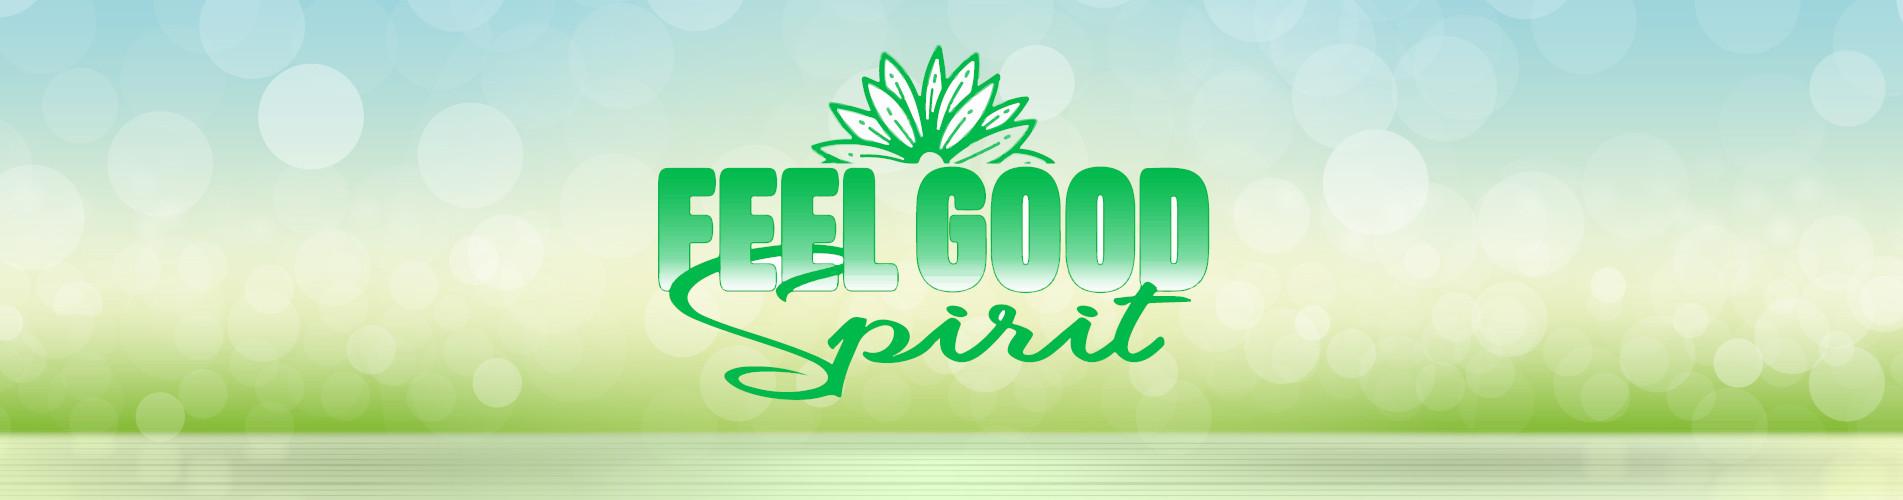 Illustration feelgood spirit